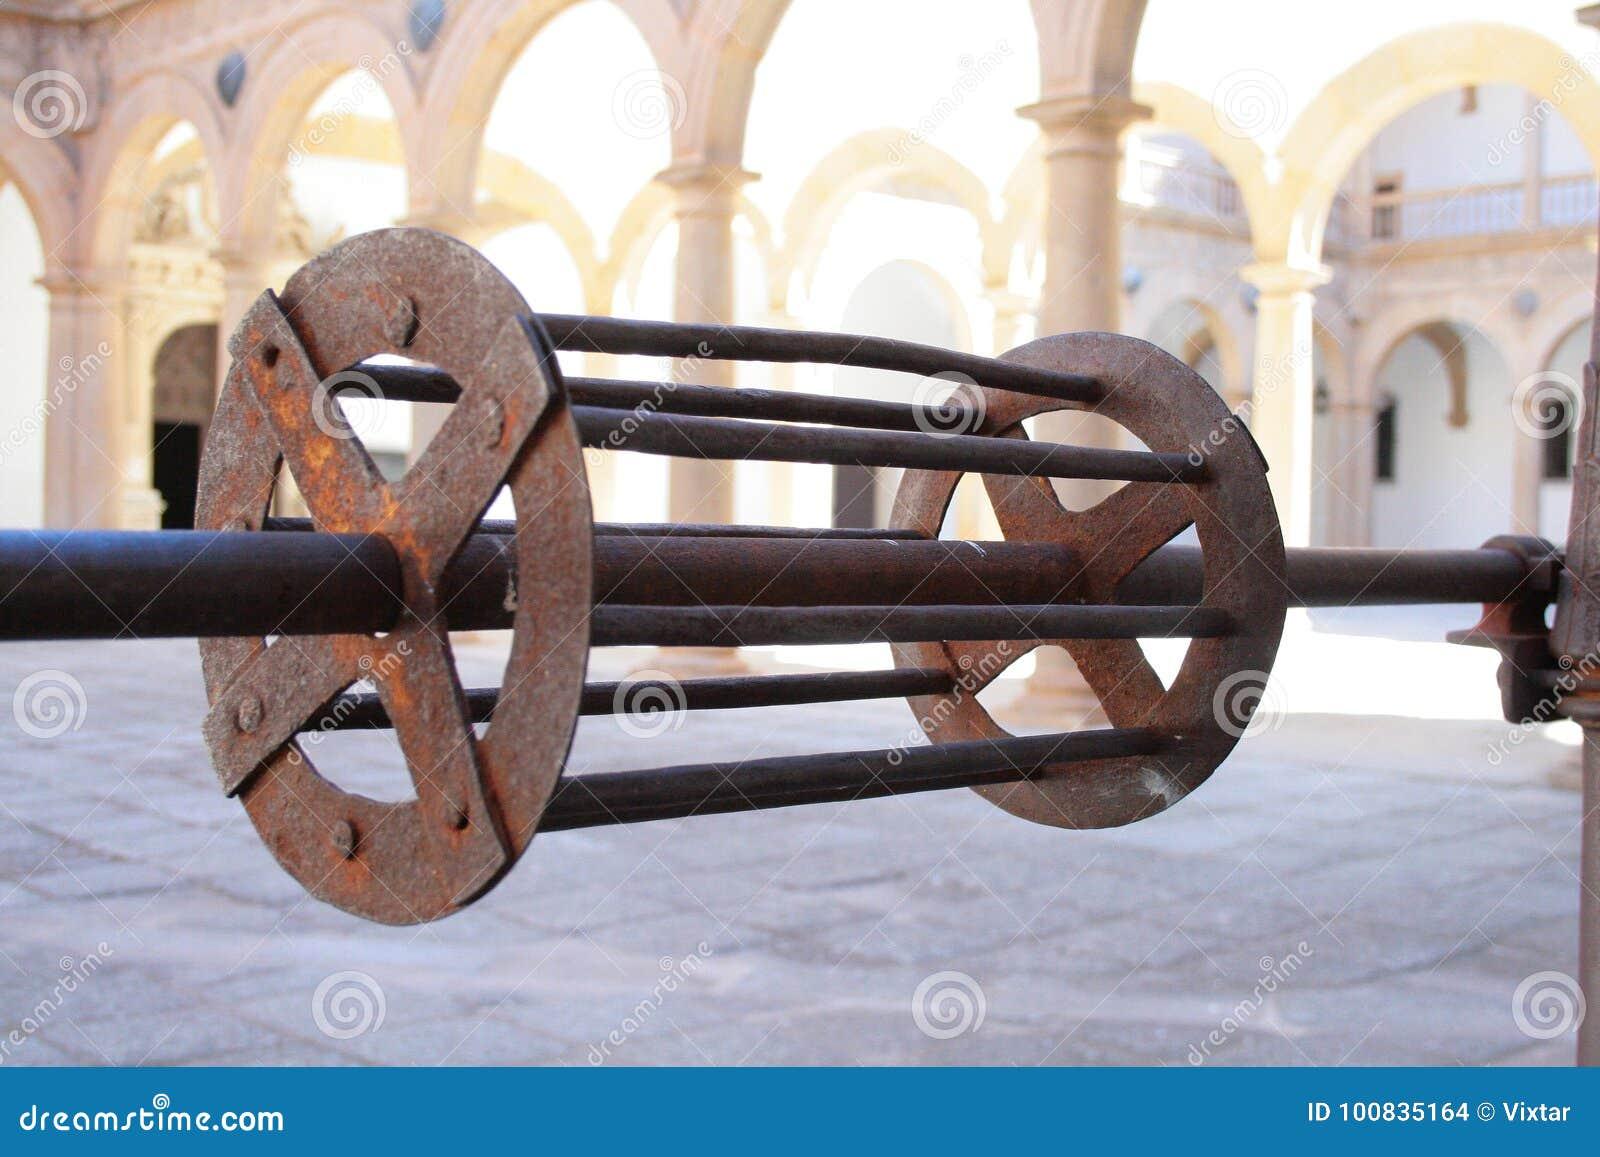 Water Well - Water Wheel Mechanism  Stock Photo - Image of